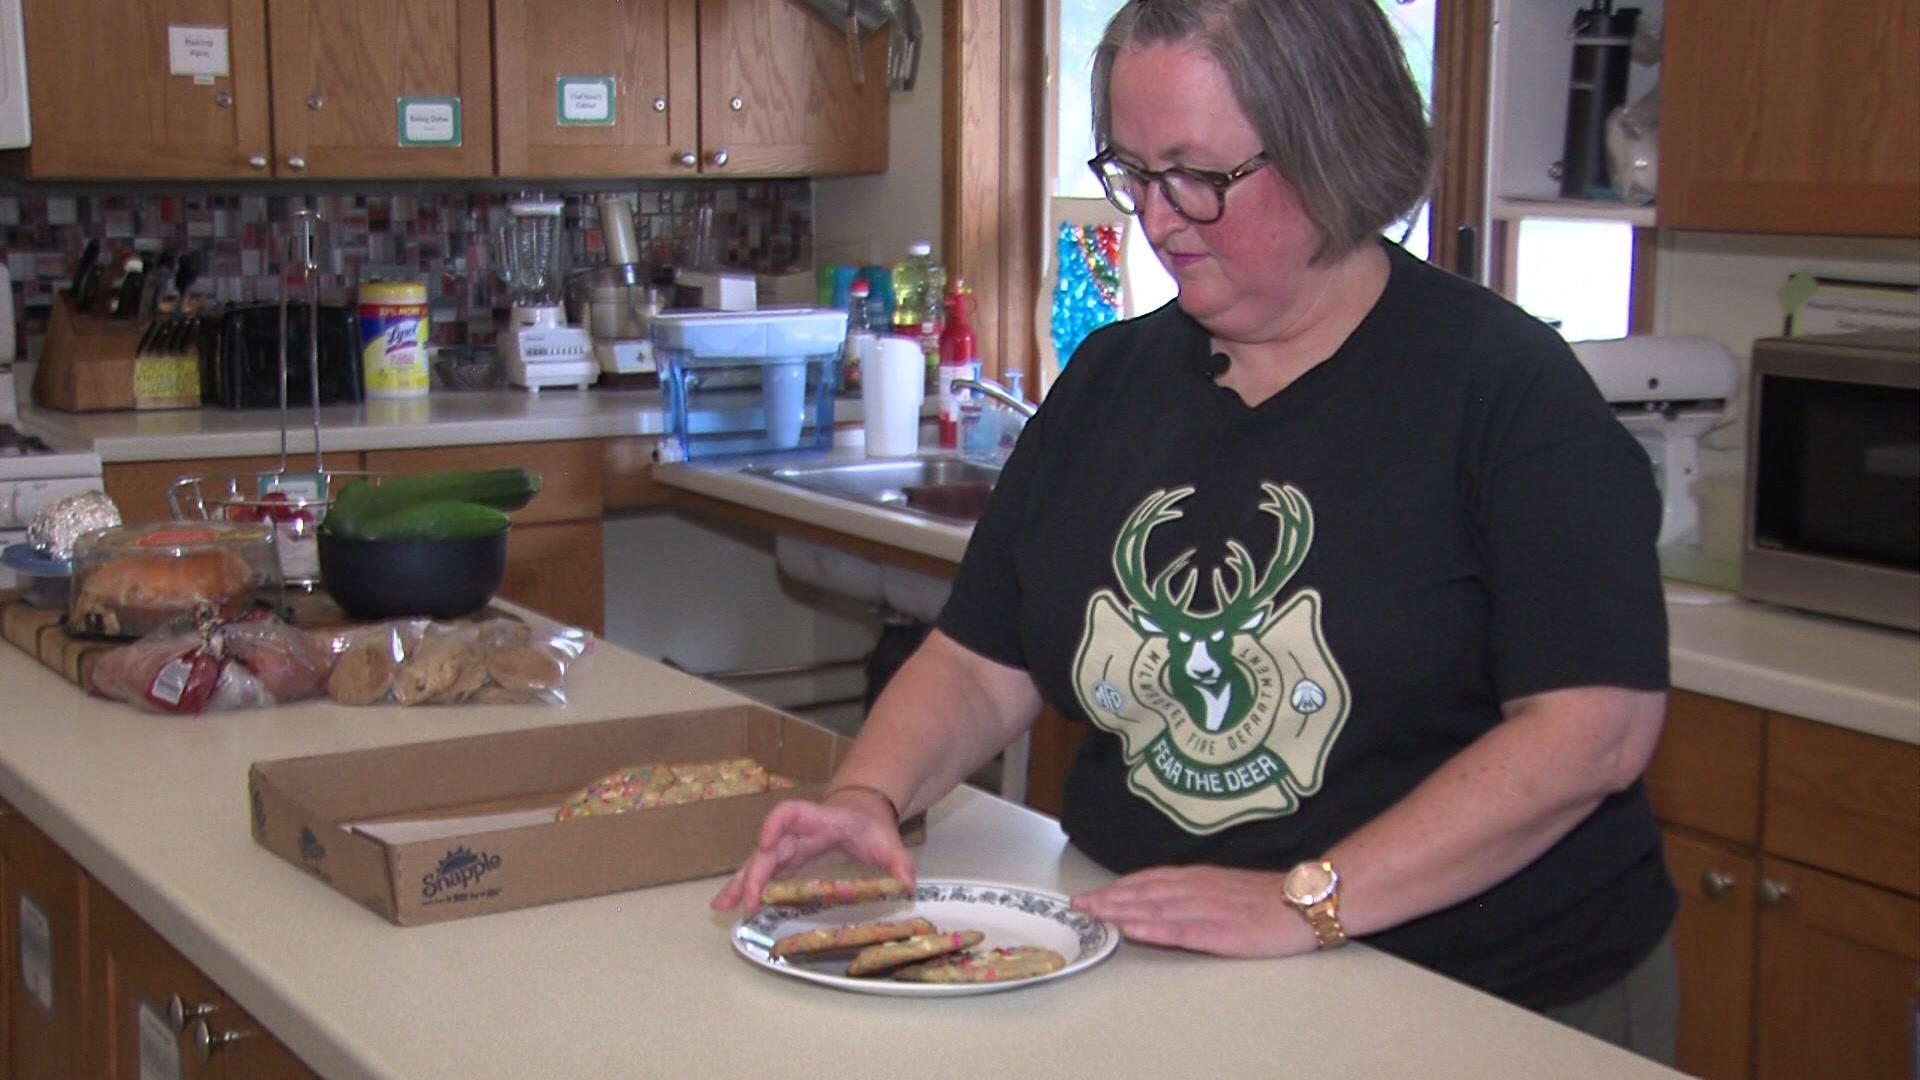 Natalie's Everyday Heroes: Kay Jensen of Kathy's House